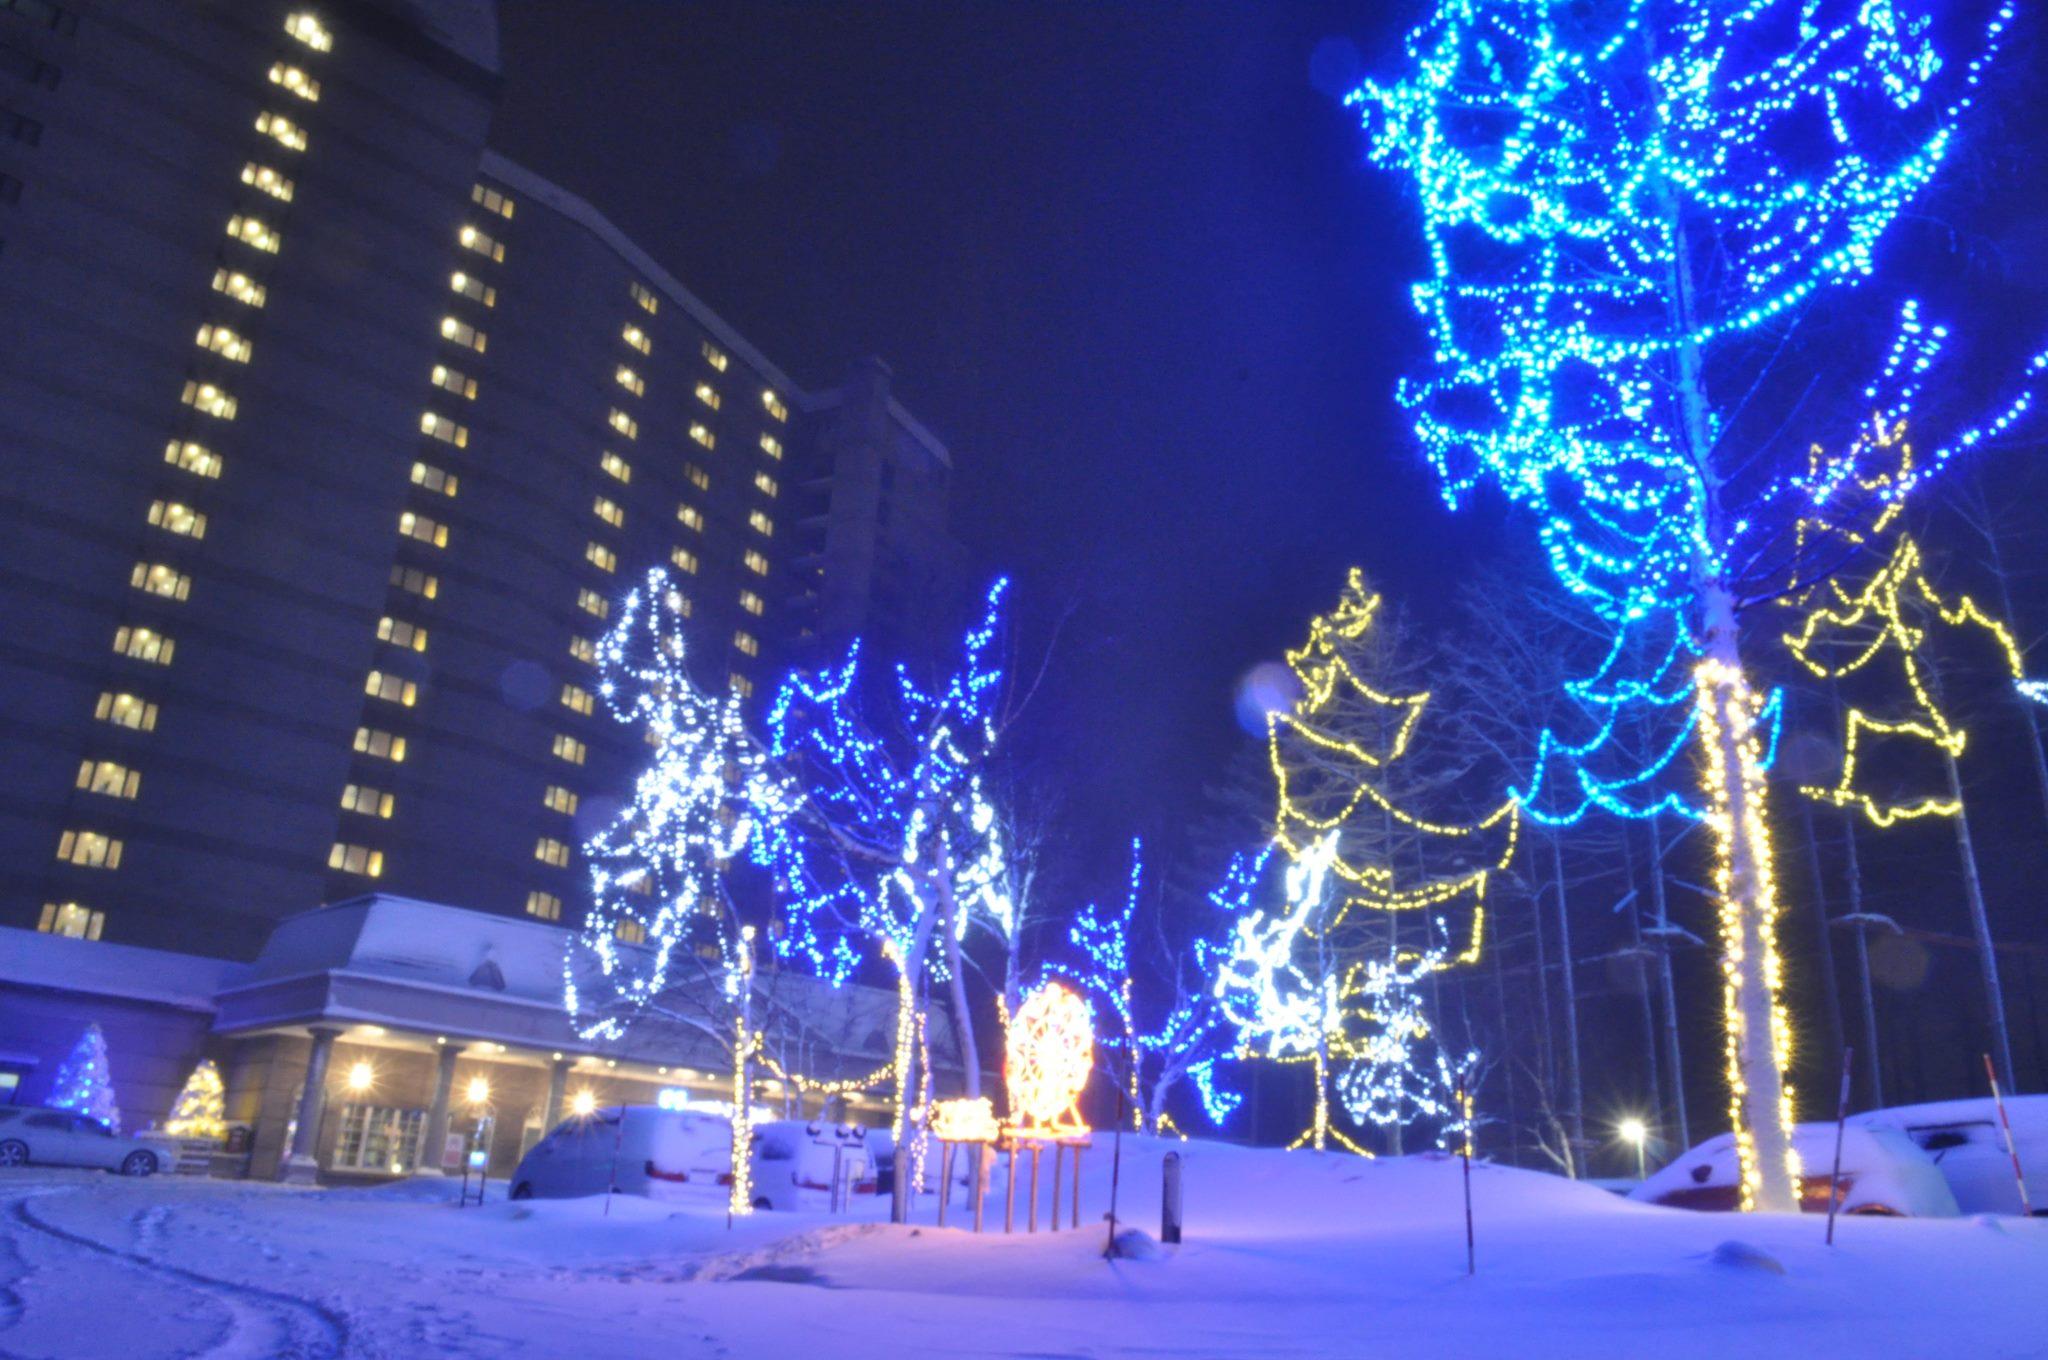 http://www.listel-inawashiro.jp/blog/730252_405846849489710_1409534257_o.jpg